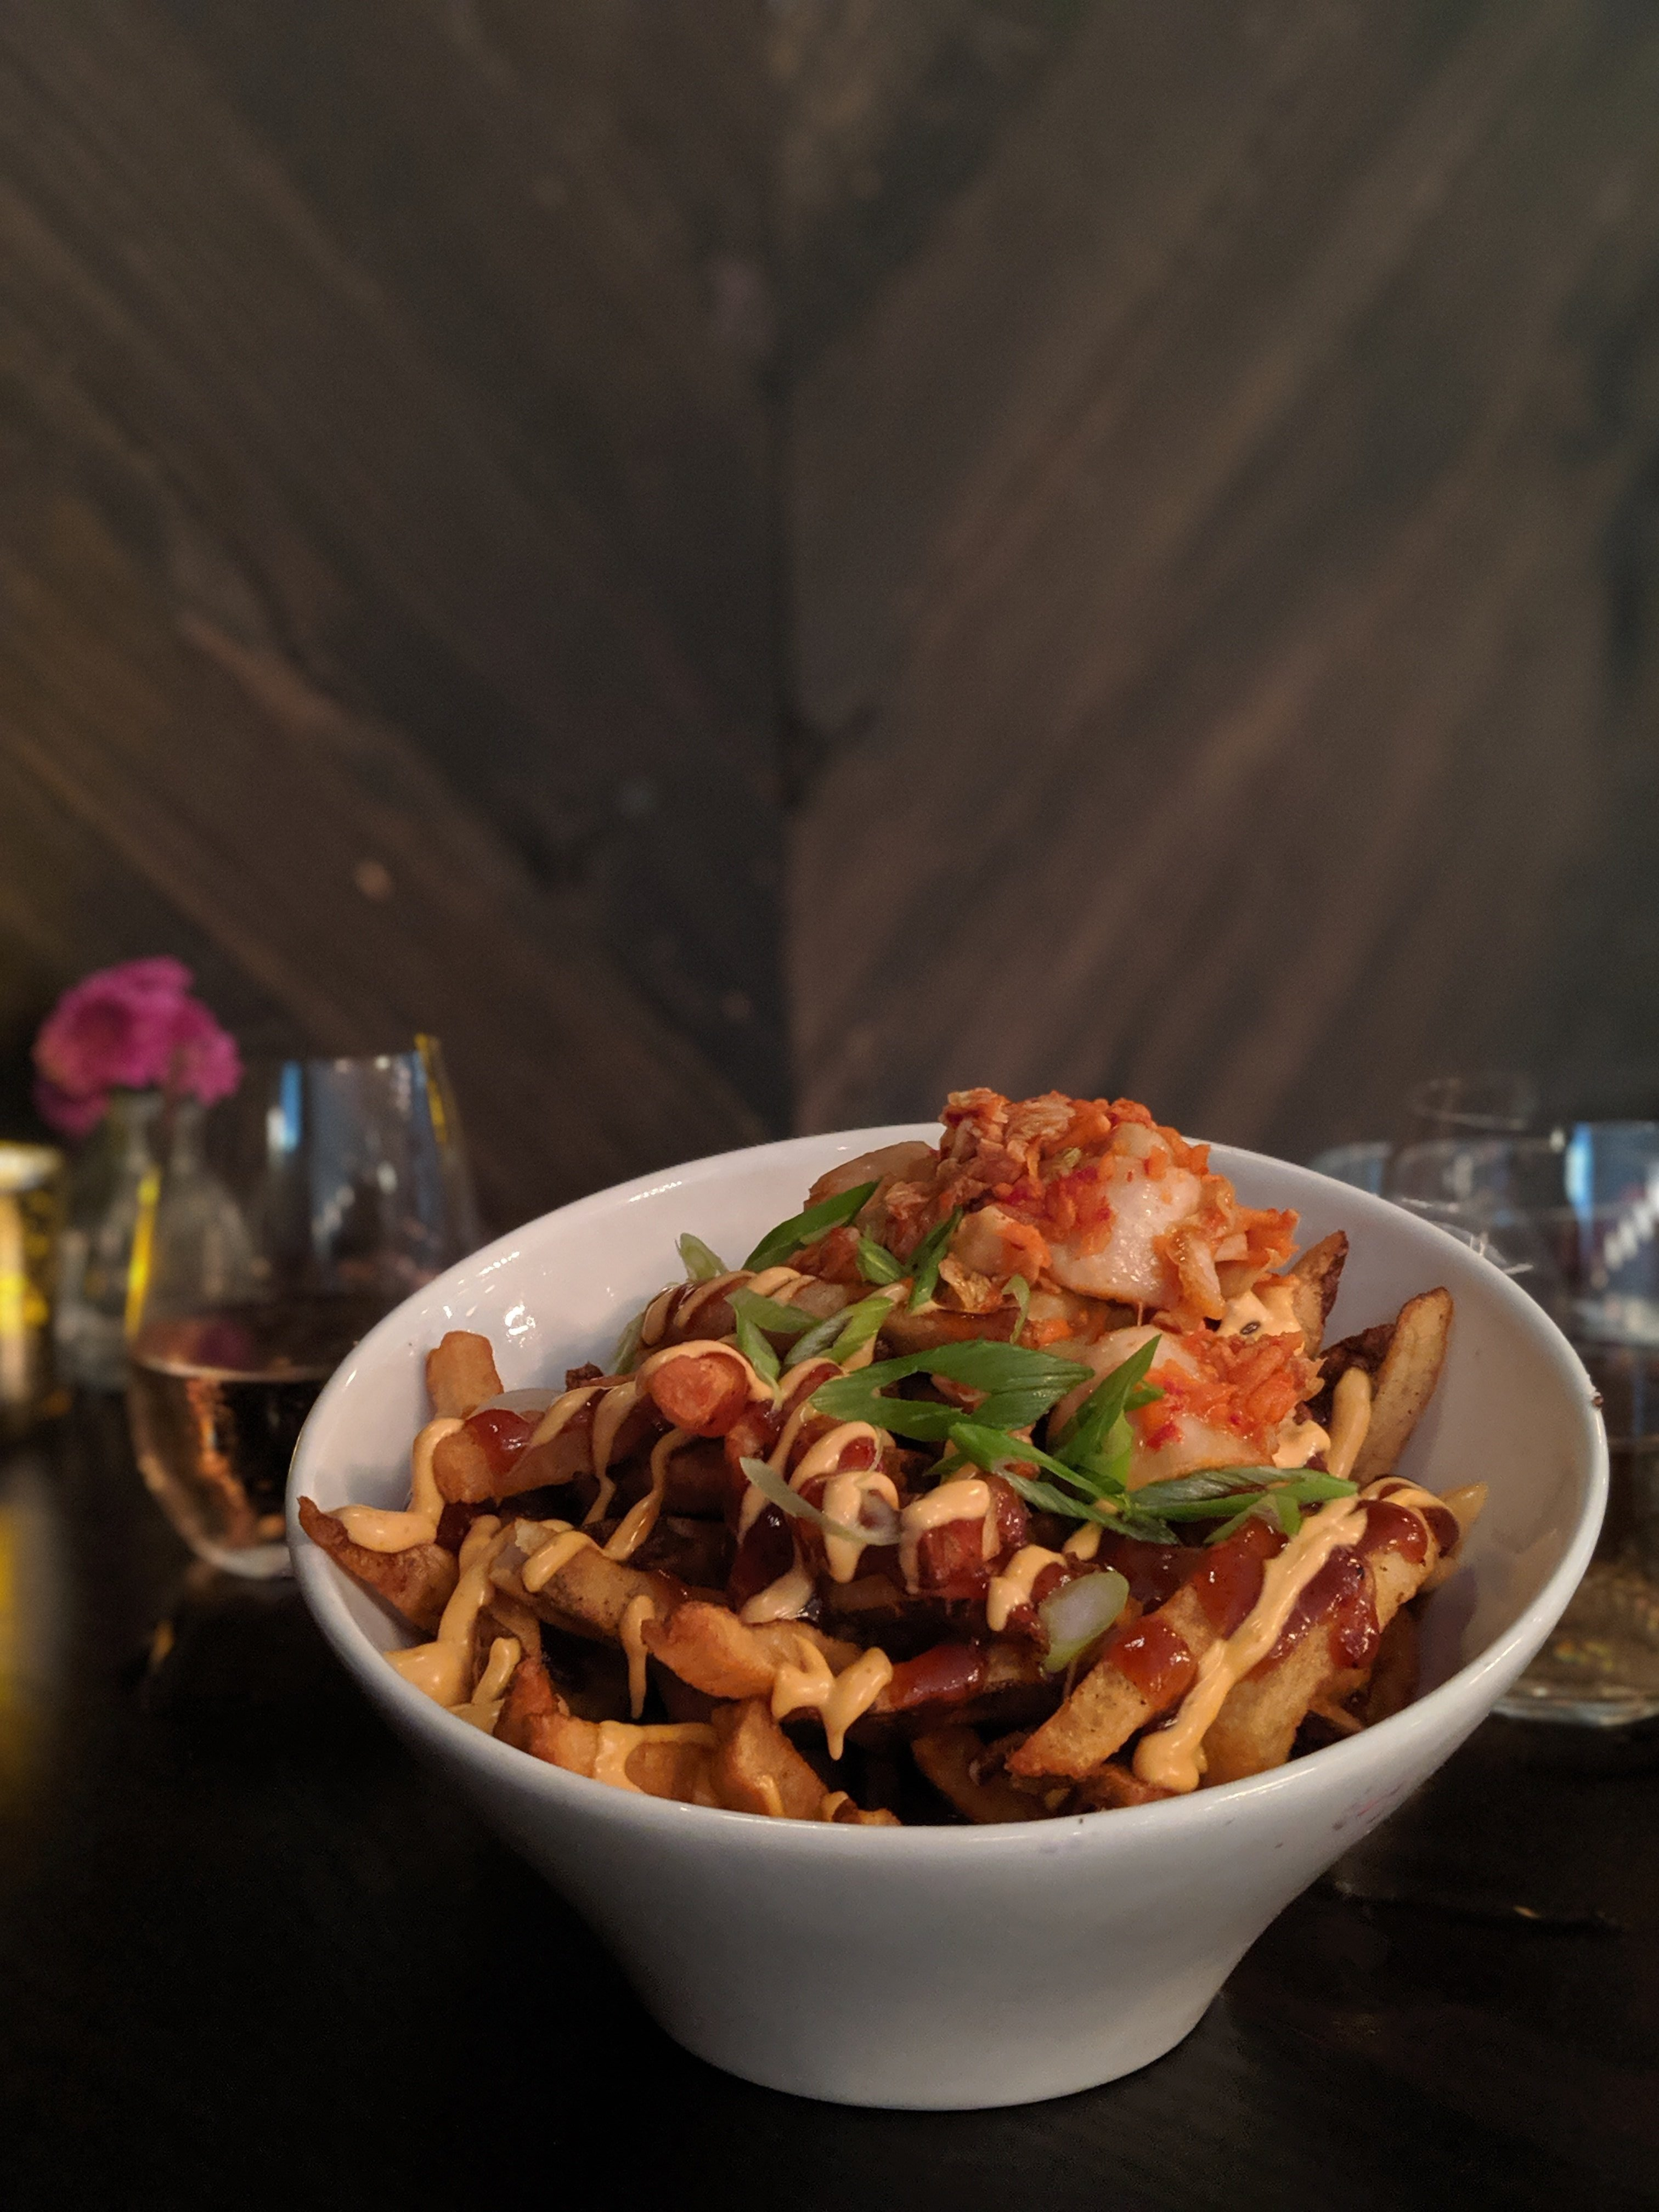 vegan kimchi fries at Modern Love in New York